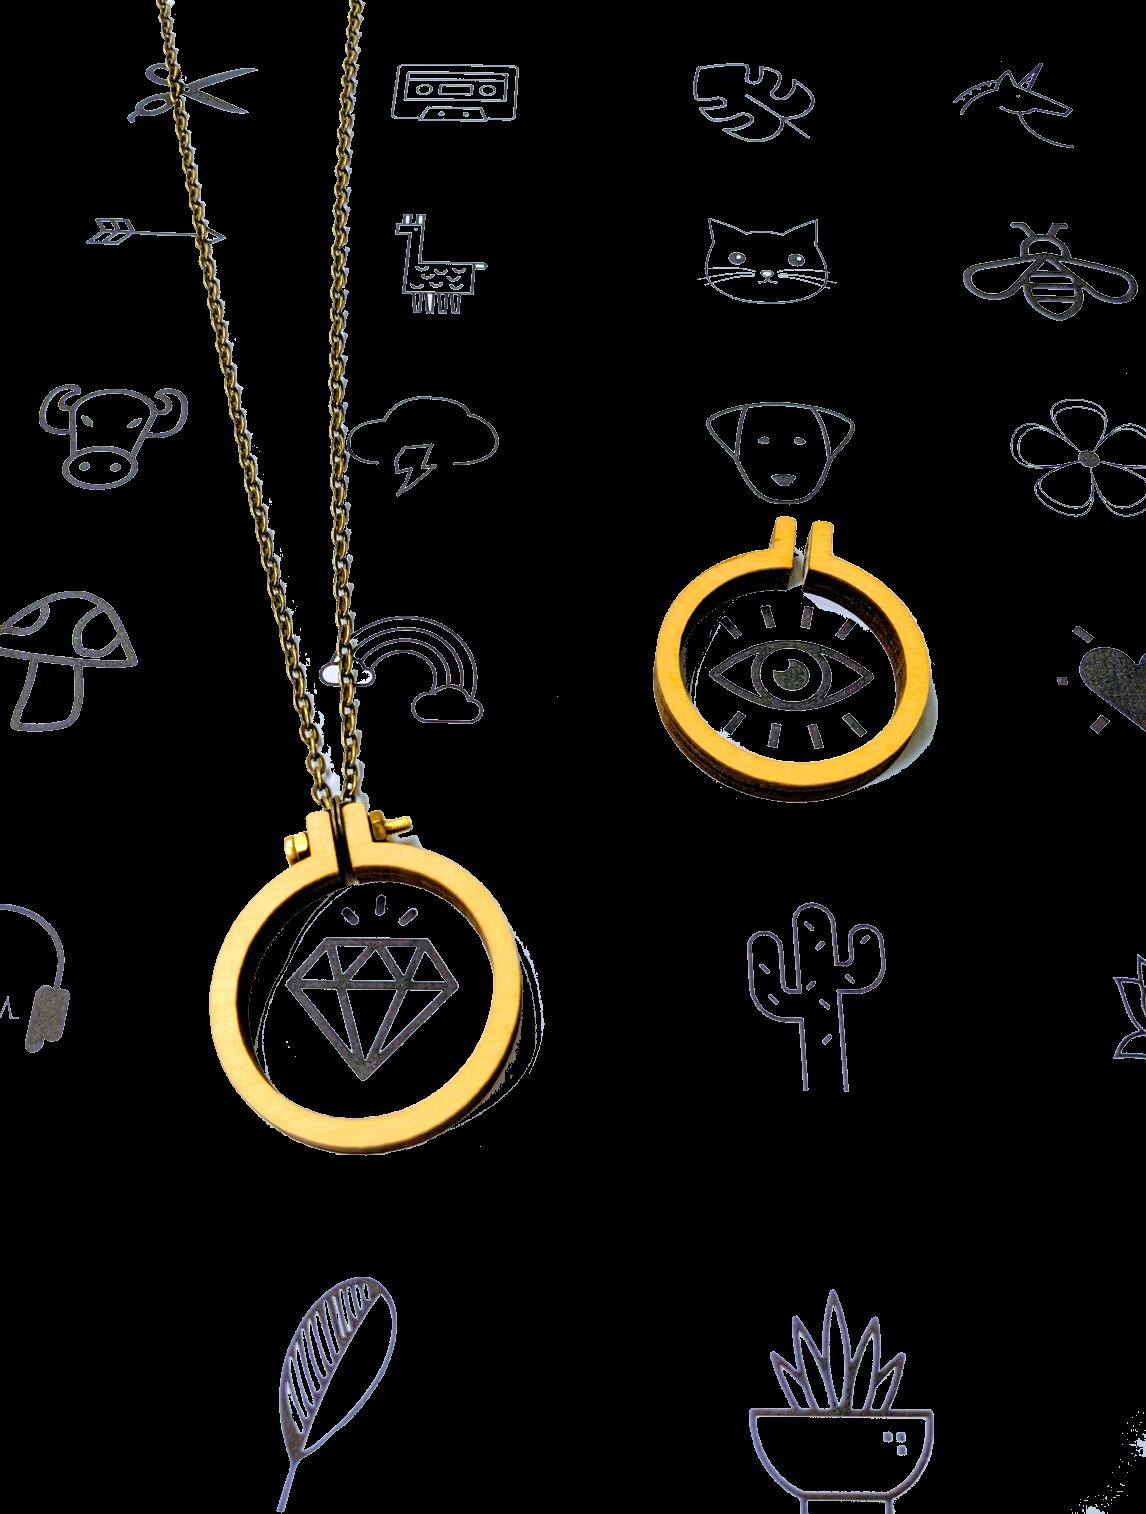 Mini Hoop Necklace Kit - Icon